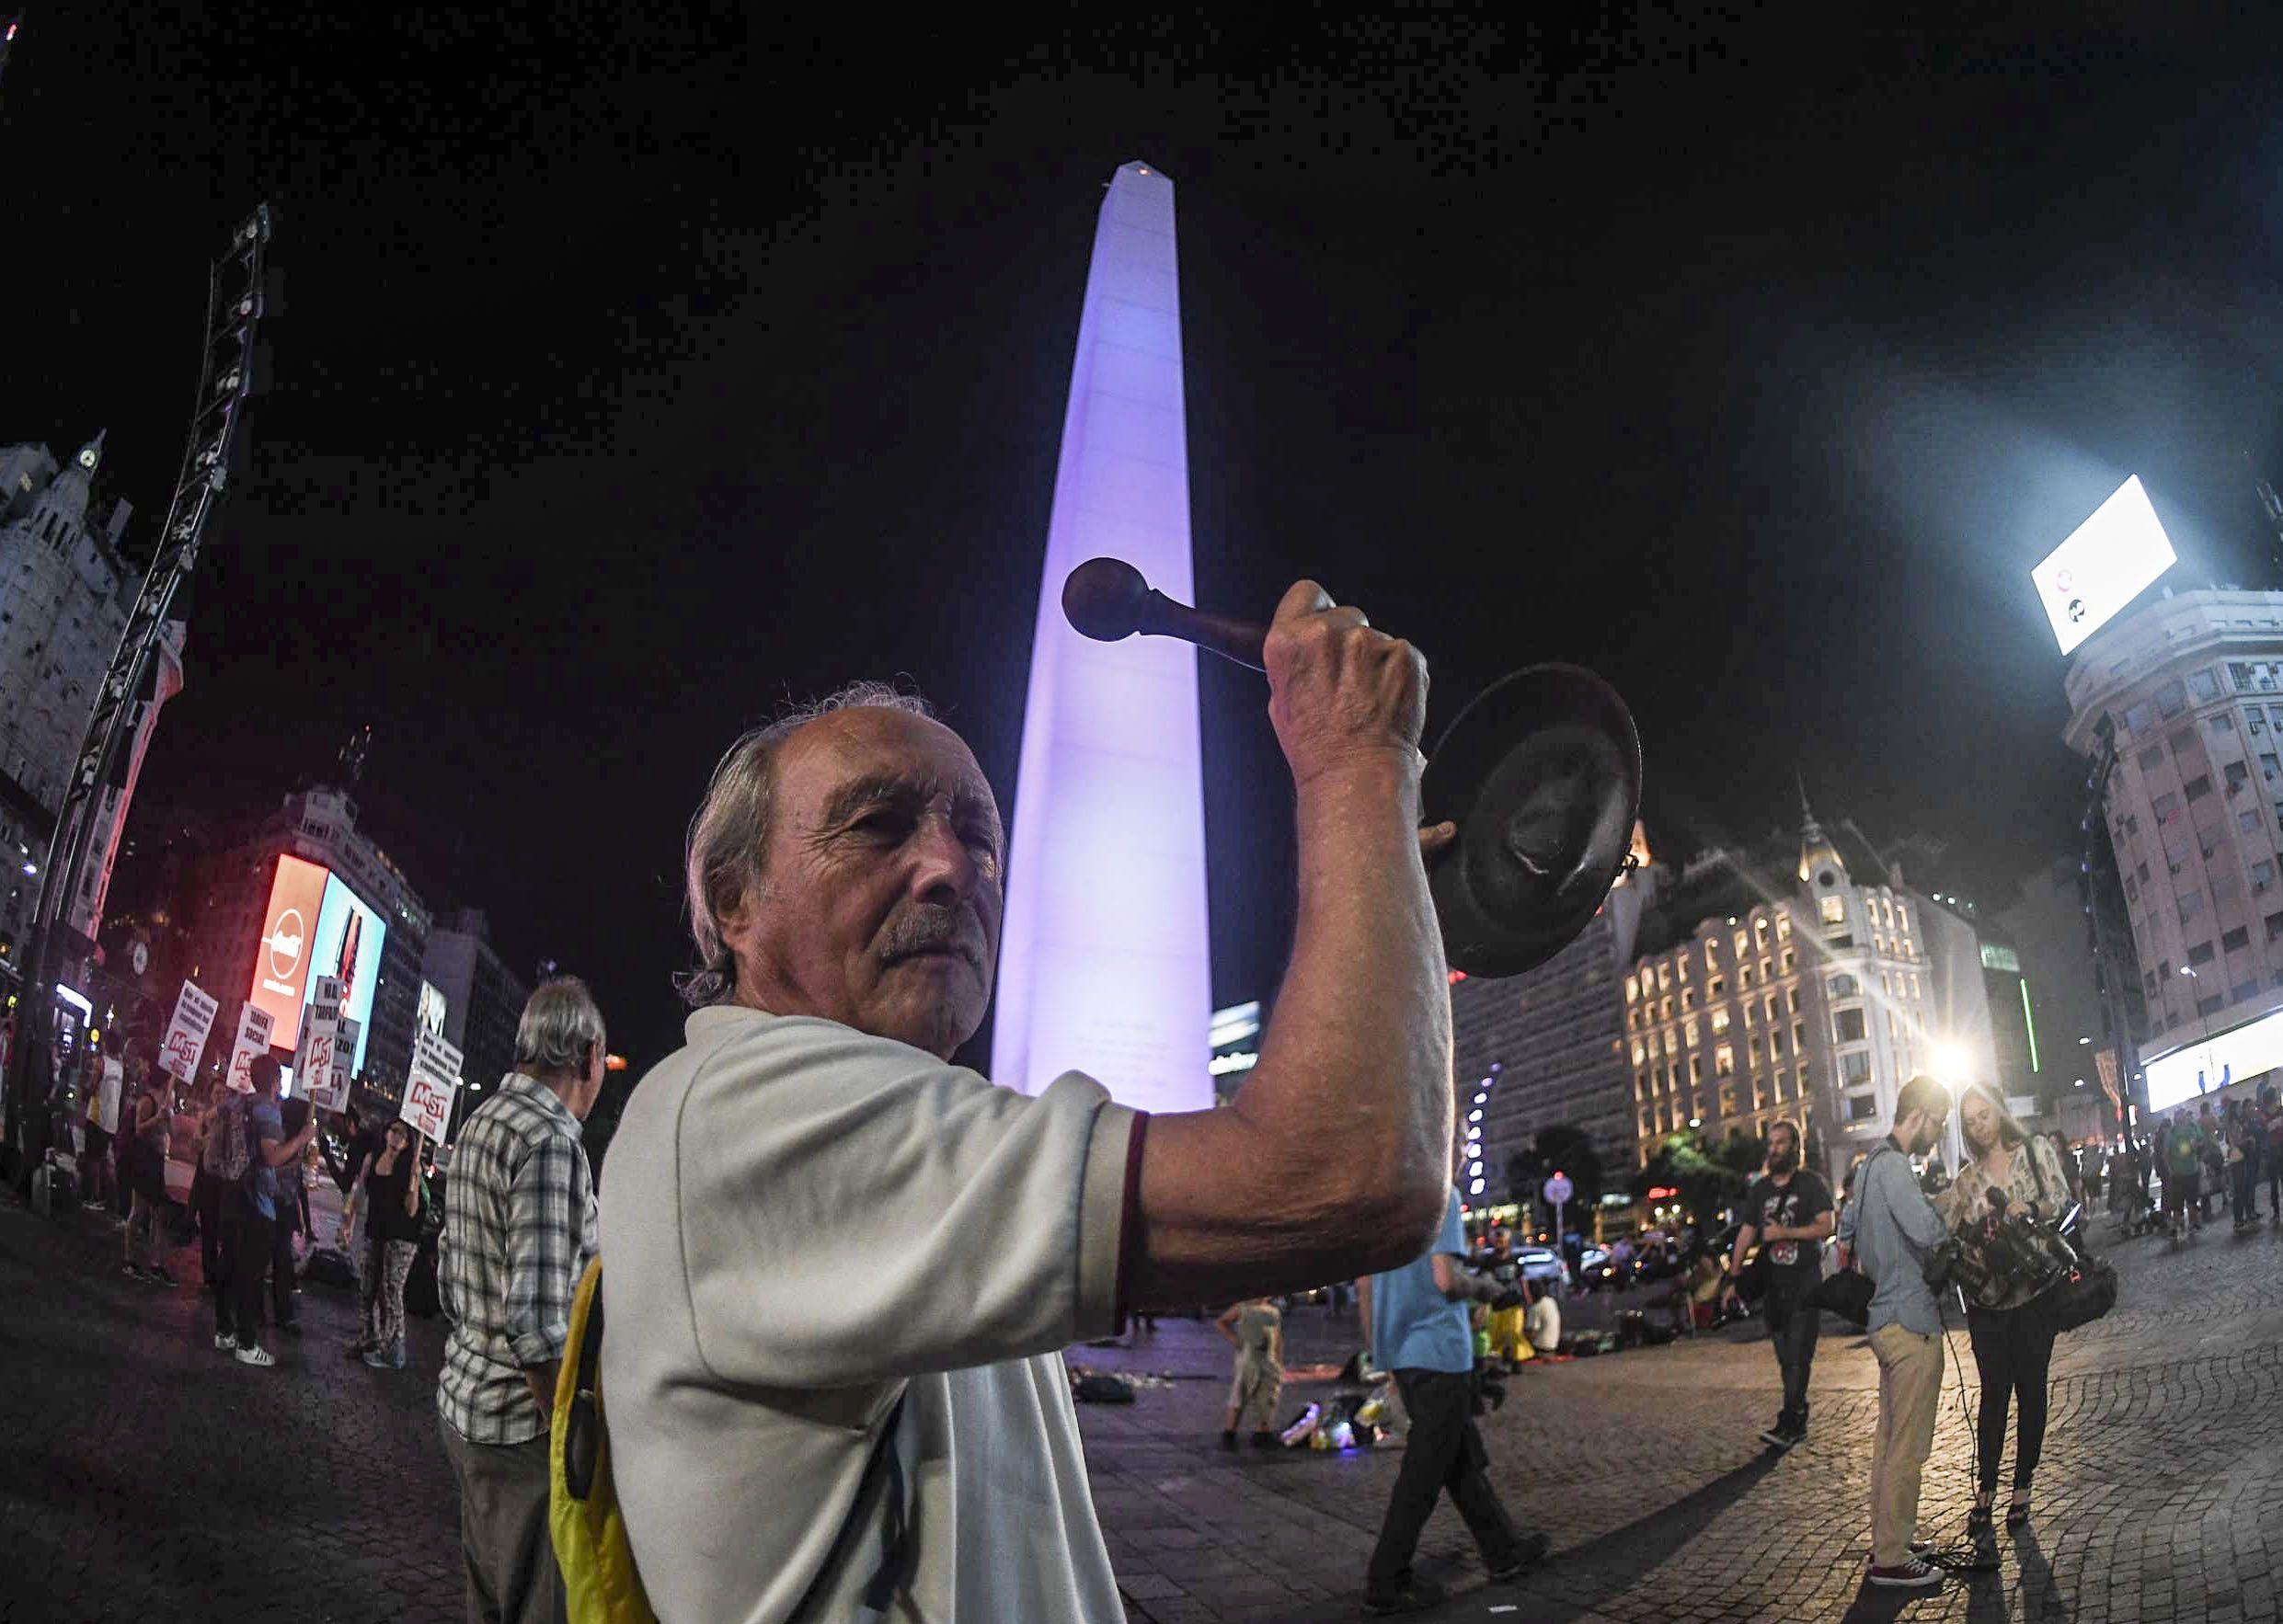 Convocan a un cacerolazo a Plaza de Mayo esta noche